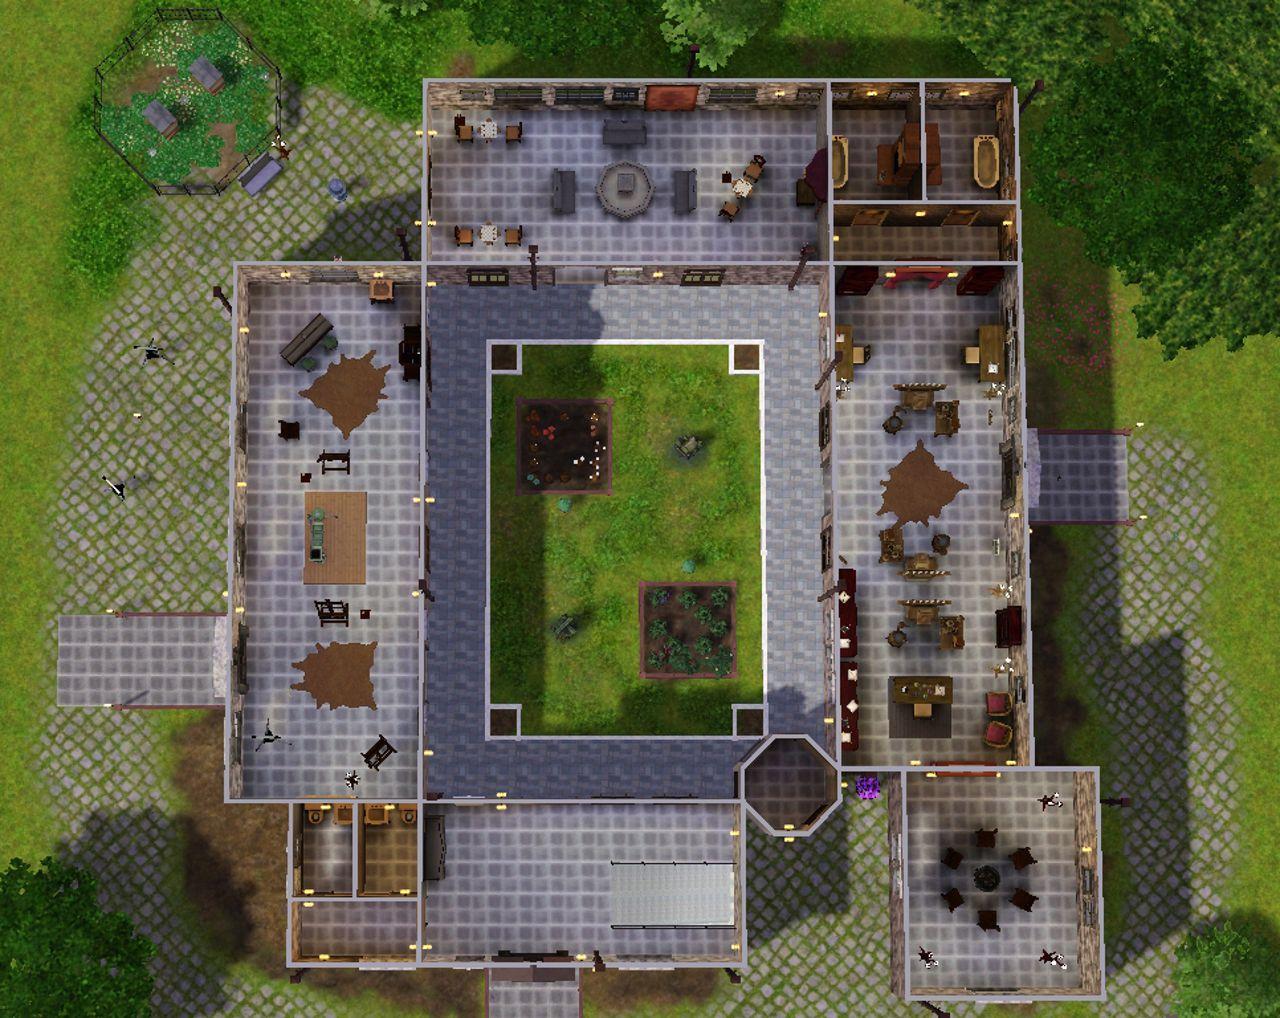 medieval inn floor plan www galleryhip com the hippest